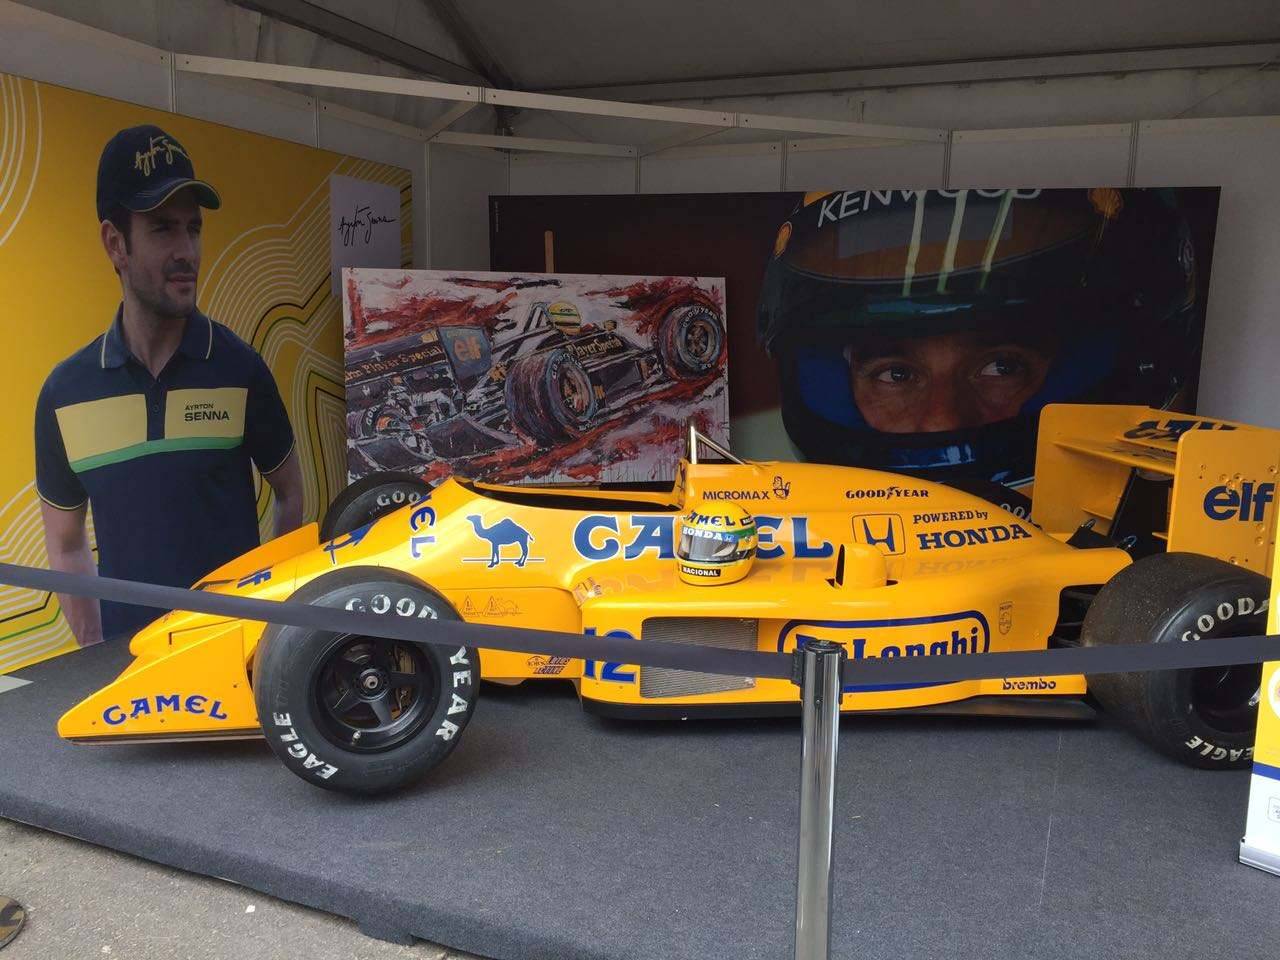 Ayrton Senna Shop é destaque em Silverstone - A história de Ayrton Senna 72dbb8a9eb0